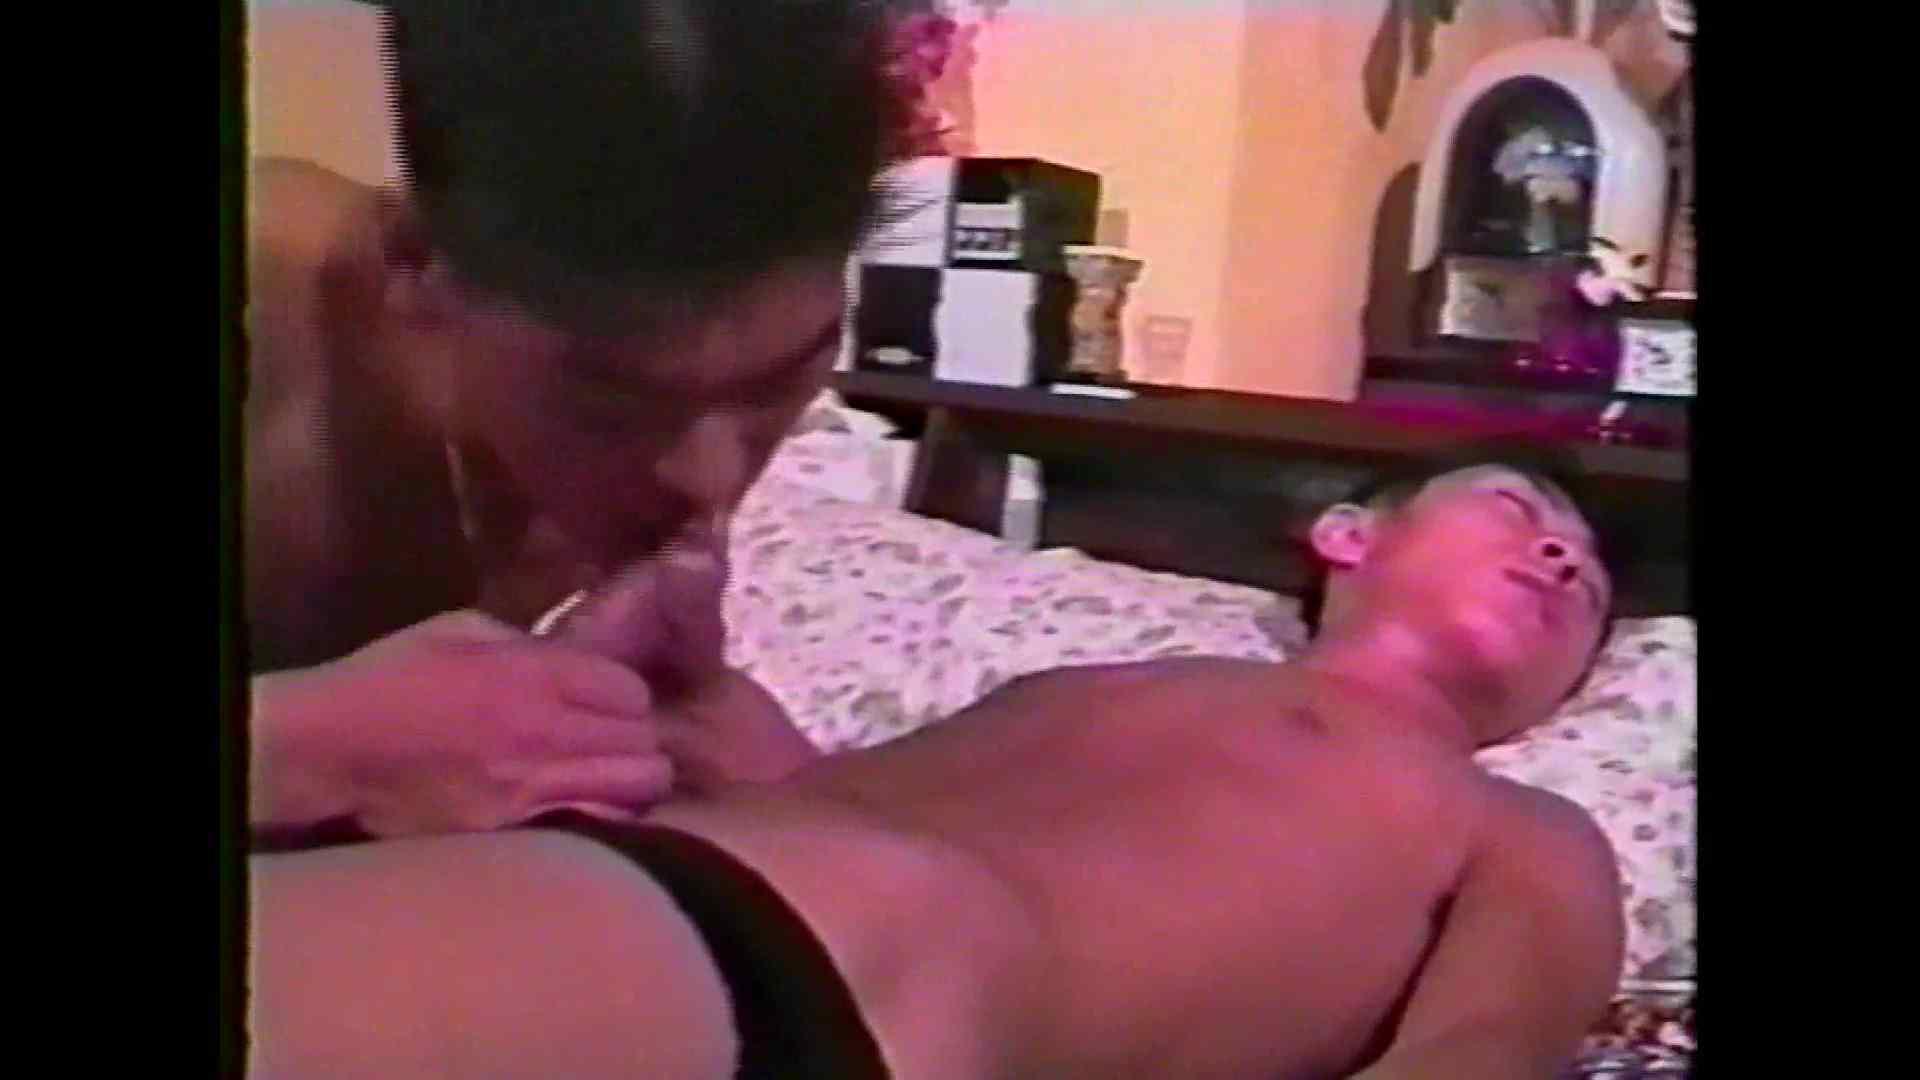 GAYBOY宏のオカズ倉庫Vol.12-1 ゲイのペニス   GAY  93枚 61